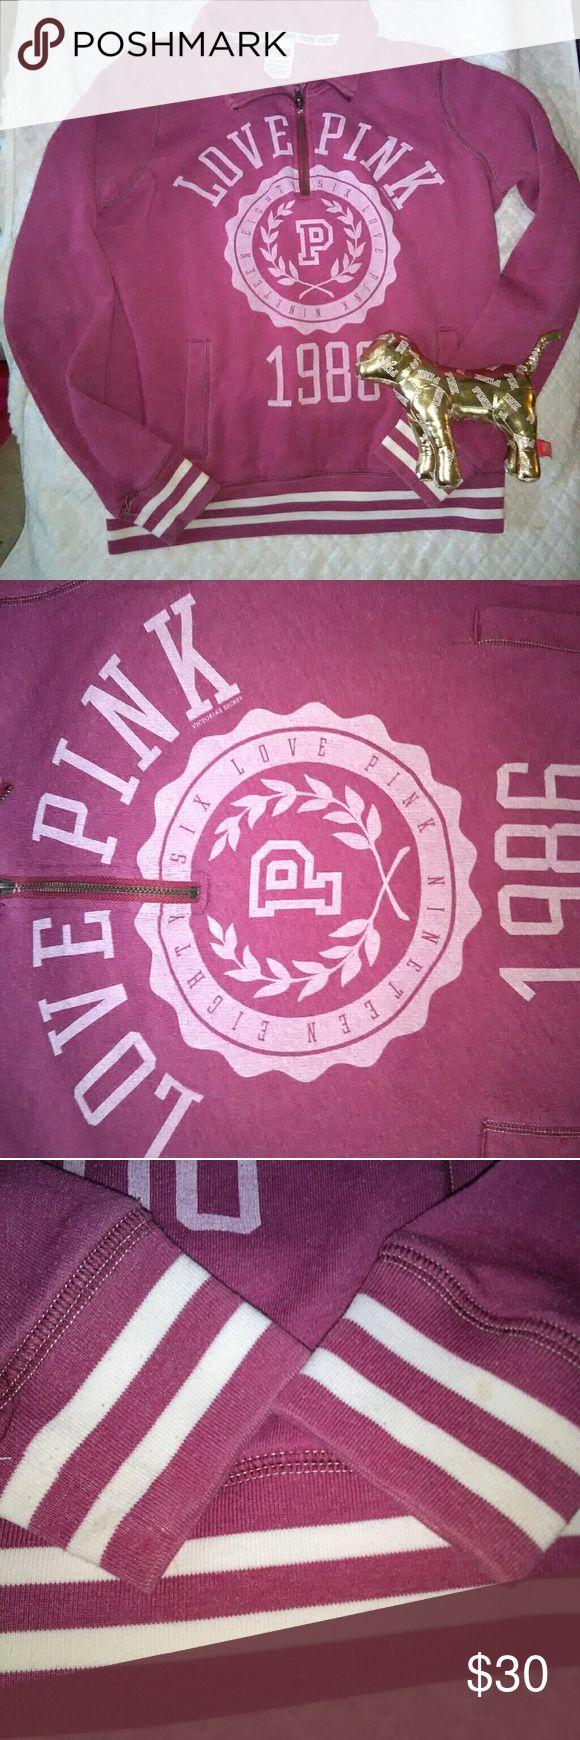 FLASH SALE VS Pink maroon jacket Vs pink maroon 1986 love Pink jacket size xs  In prefect condition PINK Victoria's Secret Jackets & Coats